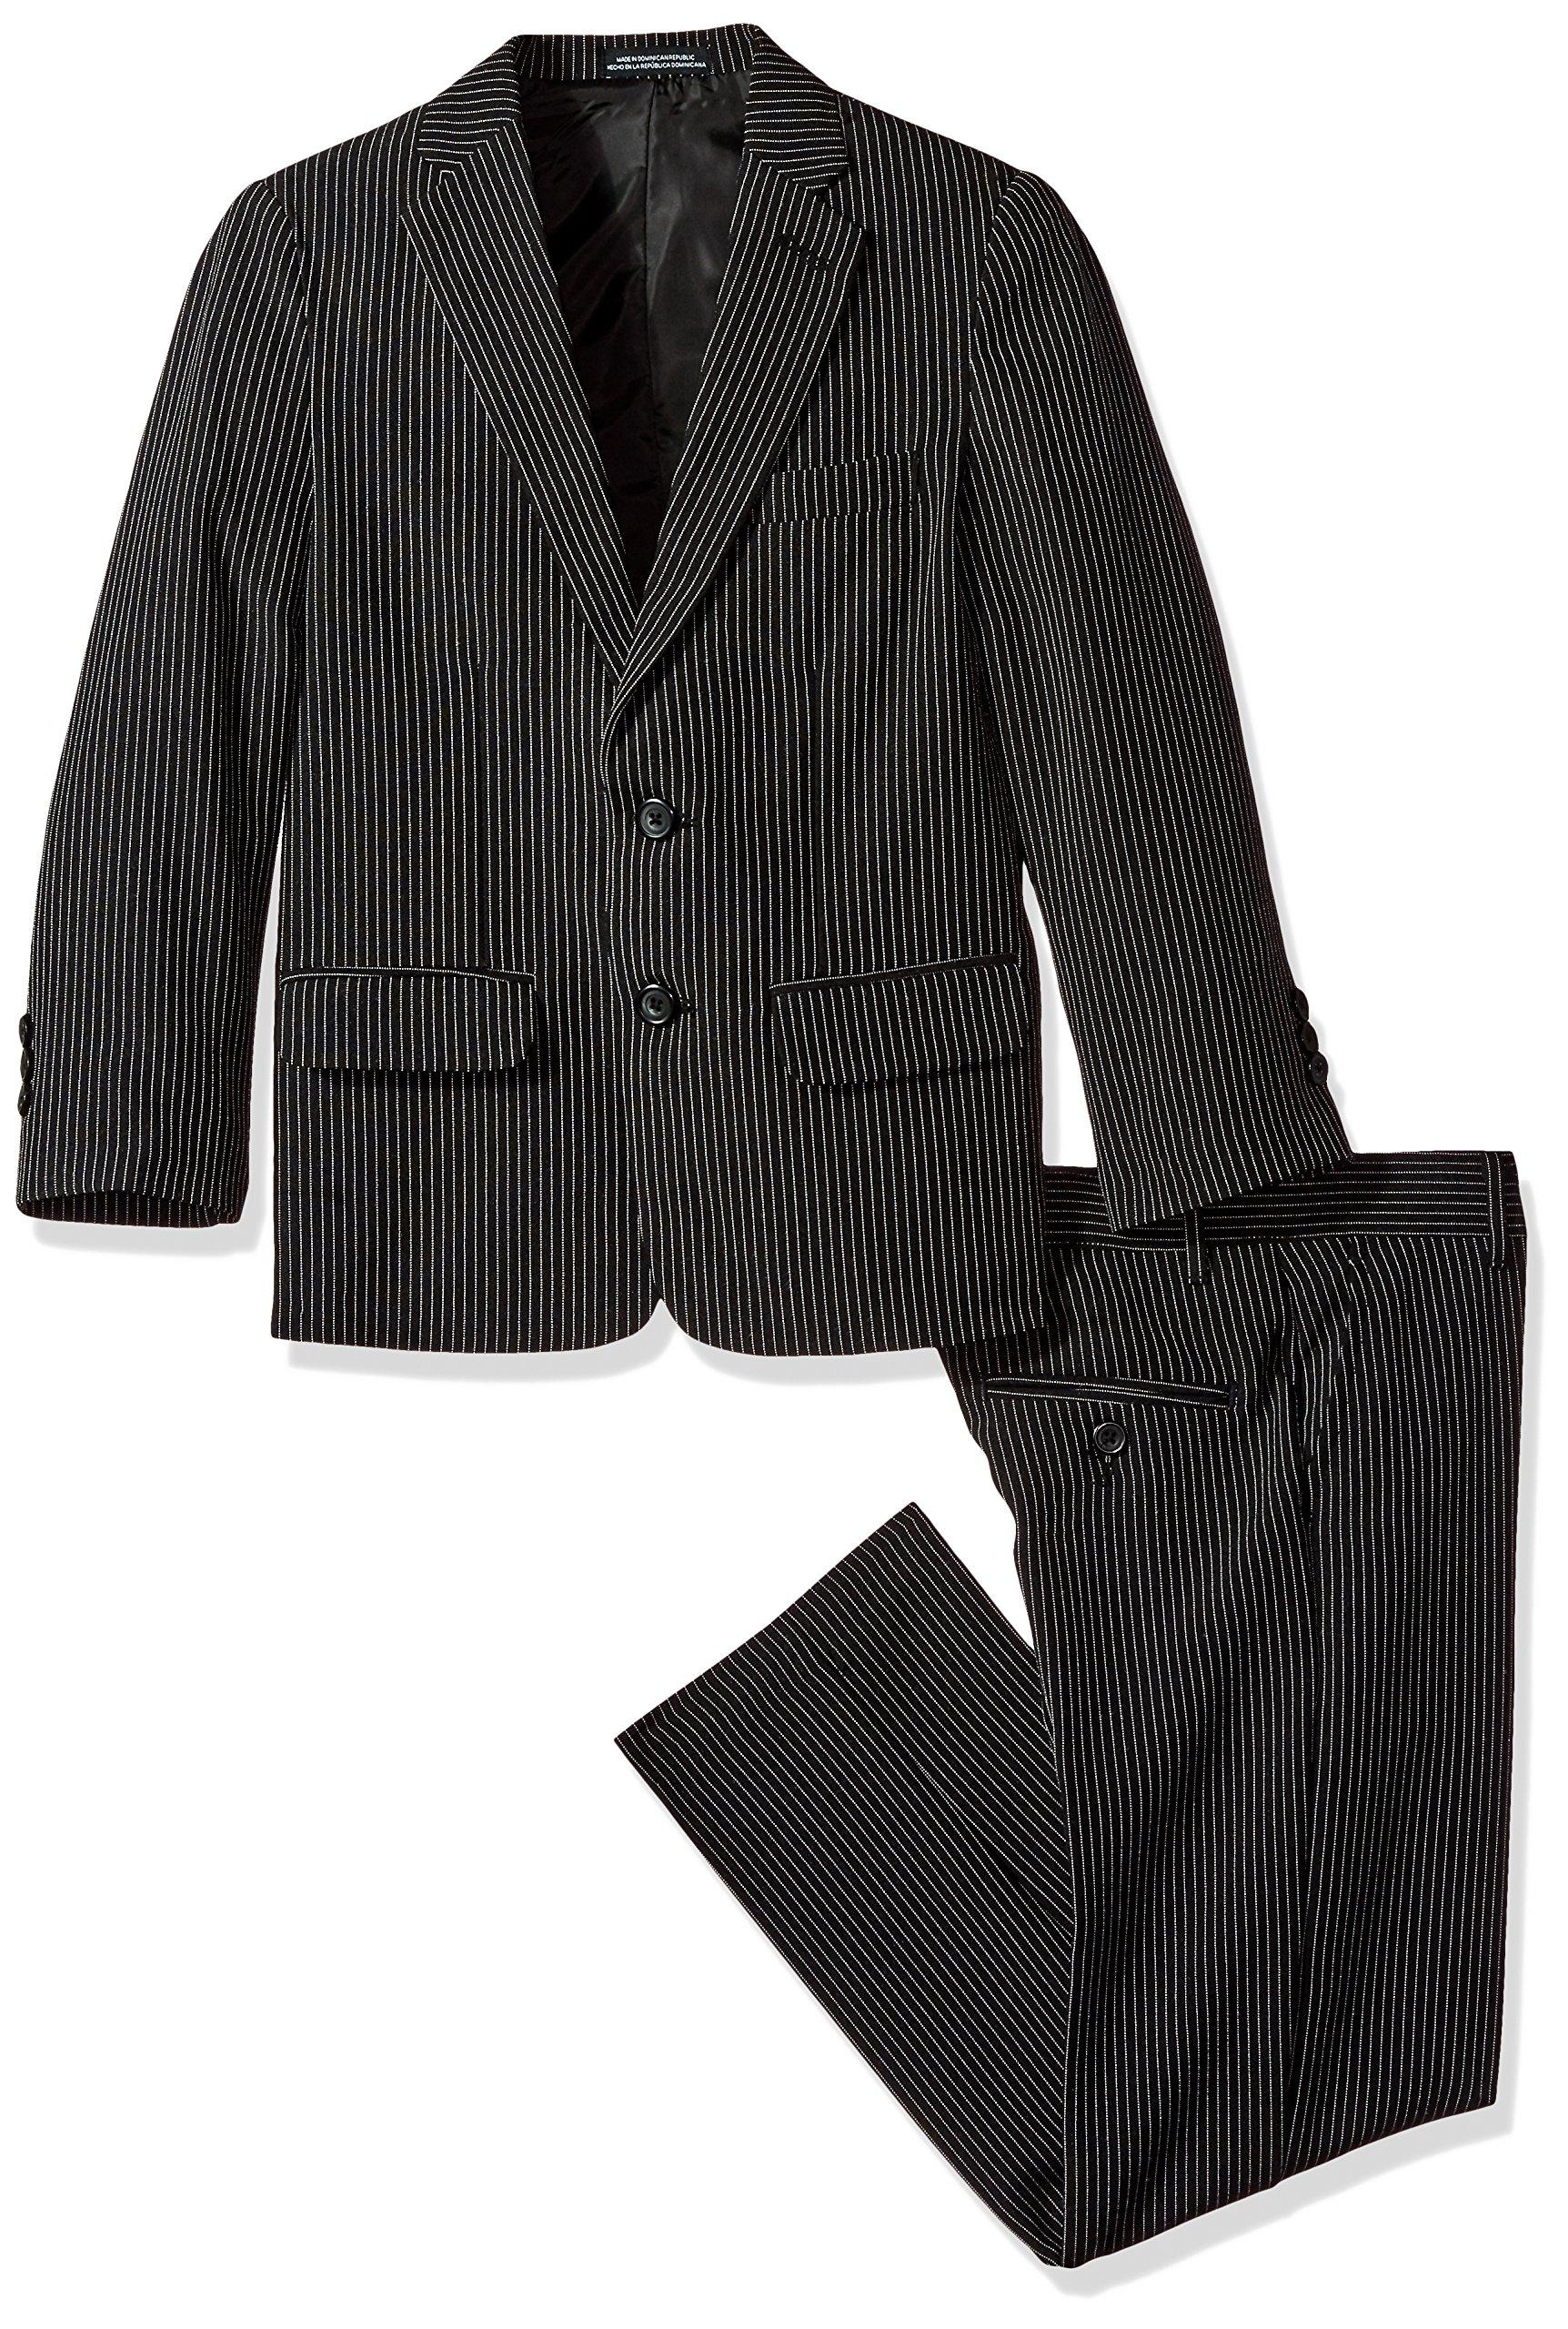 Van Heusen Big Boys' Stripe 2 Pc Suit, Black, 8